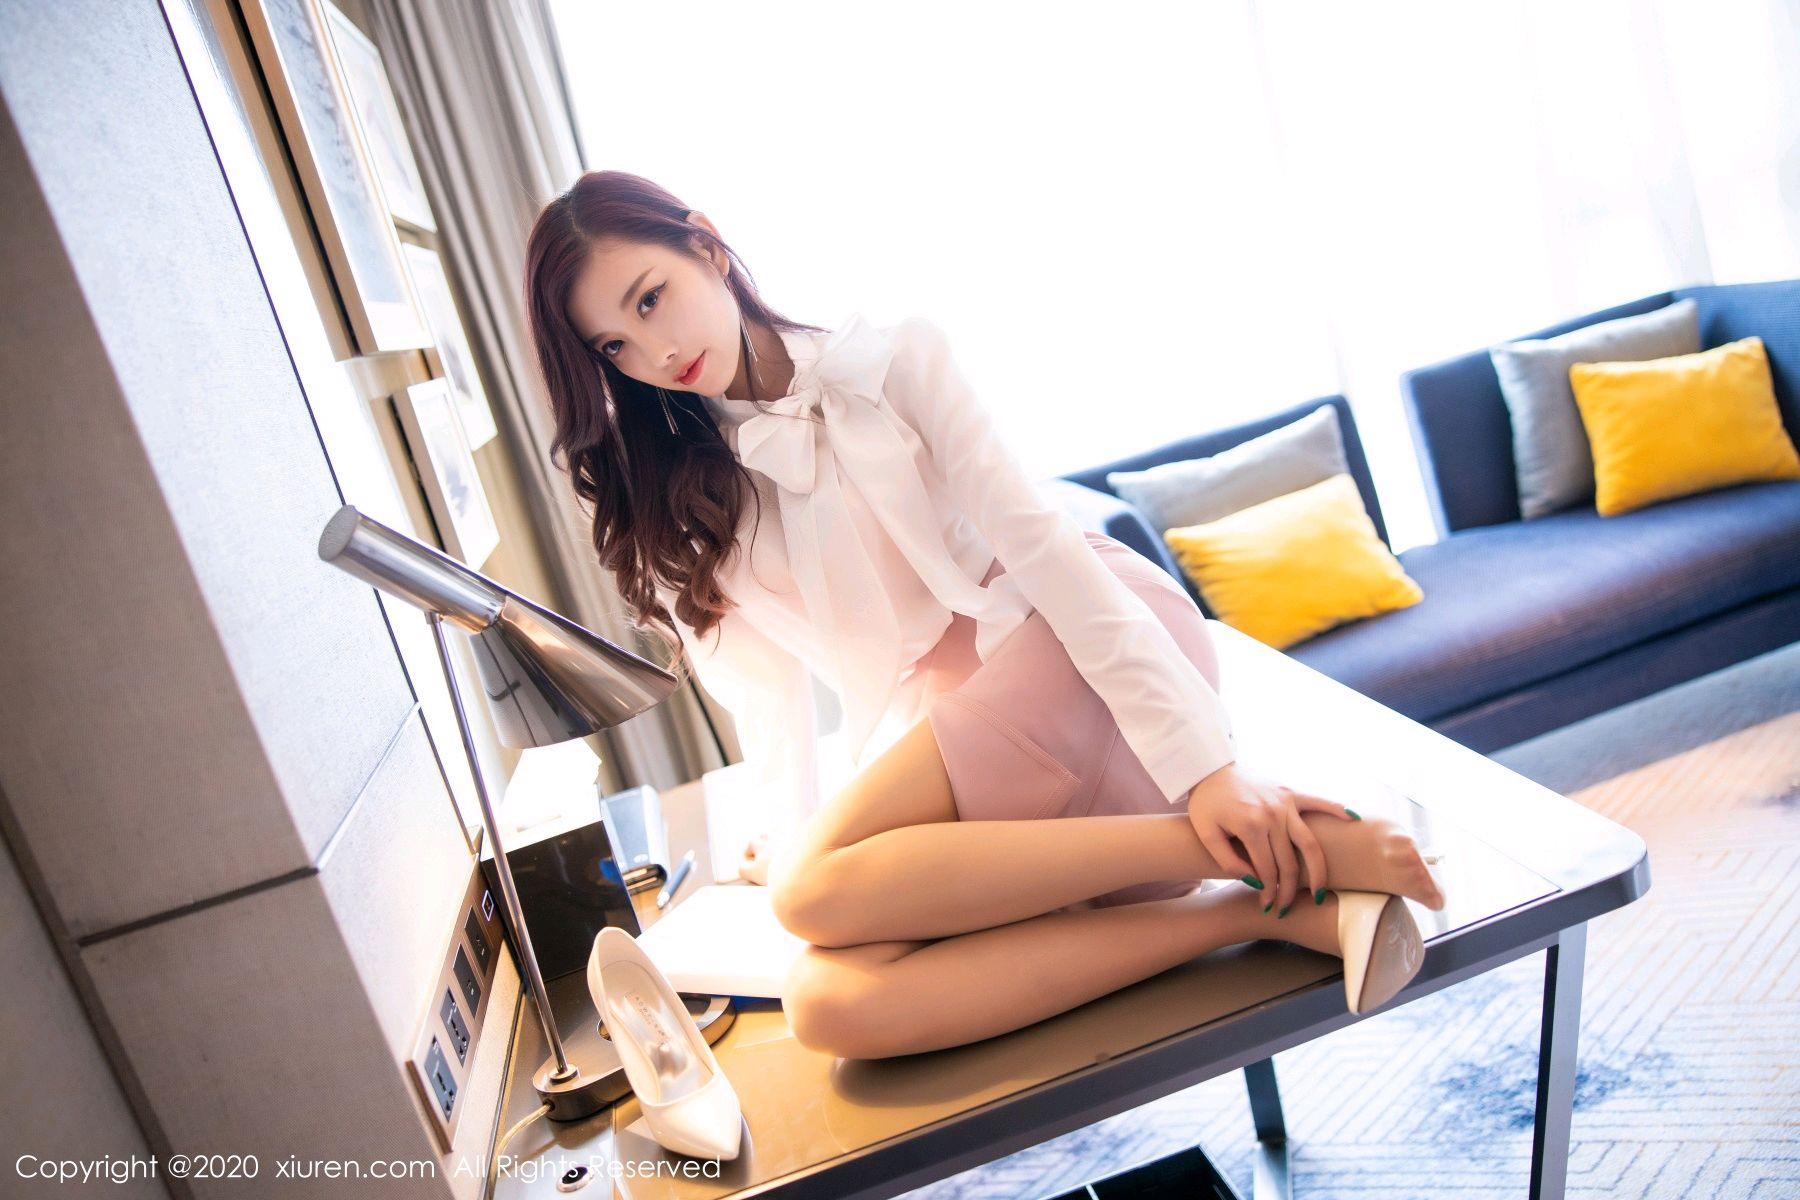 [XiuRen] Vol.2431 Yang Chen Chen 26P, Tall, Underwear, Uniform, Xiuren, Yang Chen Chen